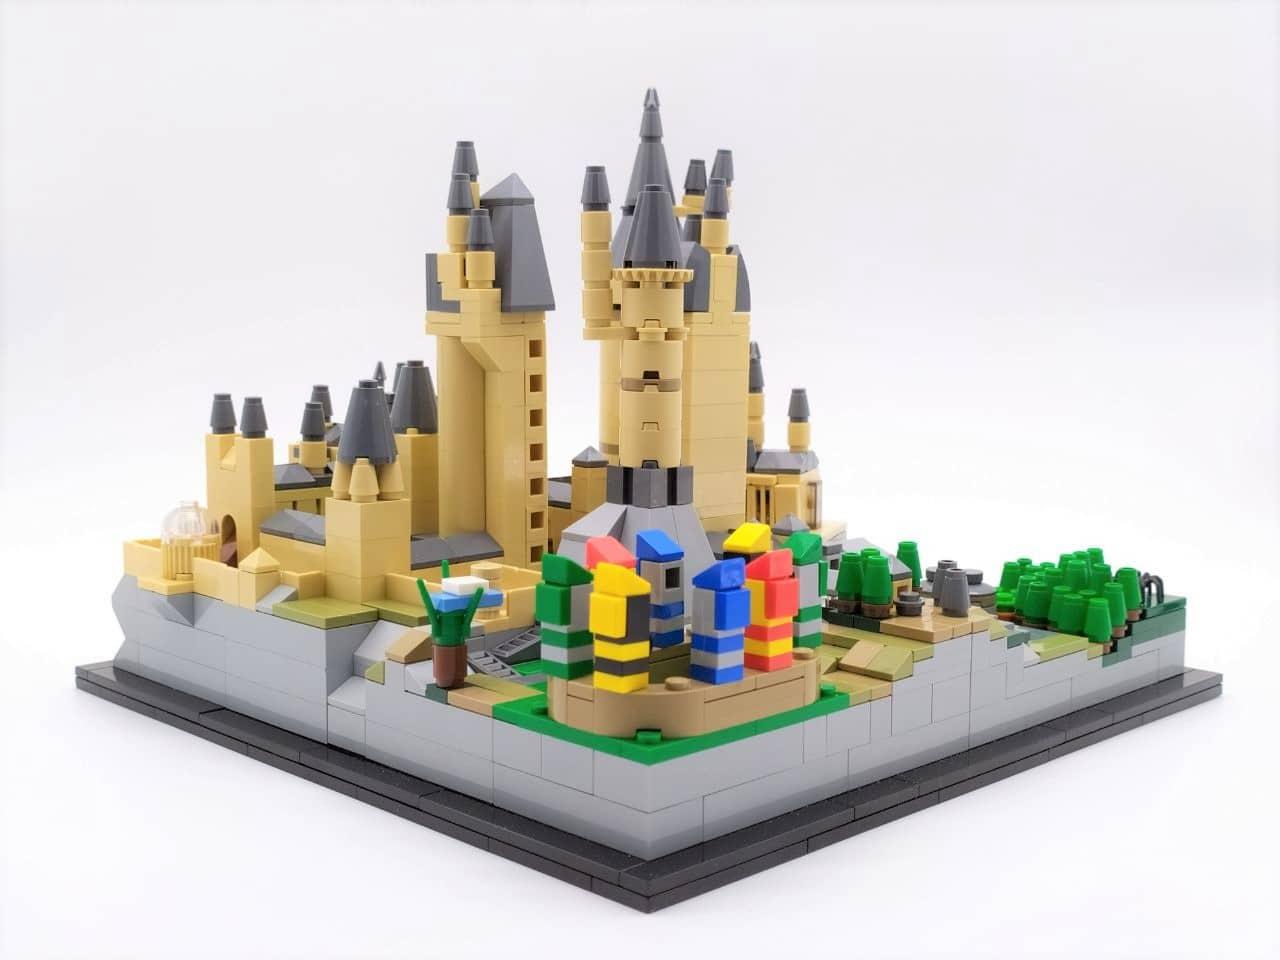 lego moc Hogwarts caslte